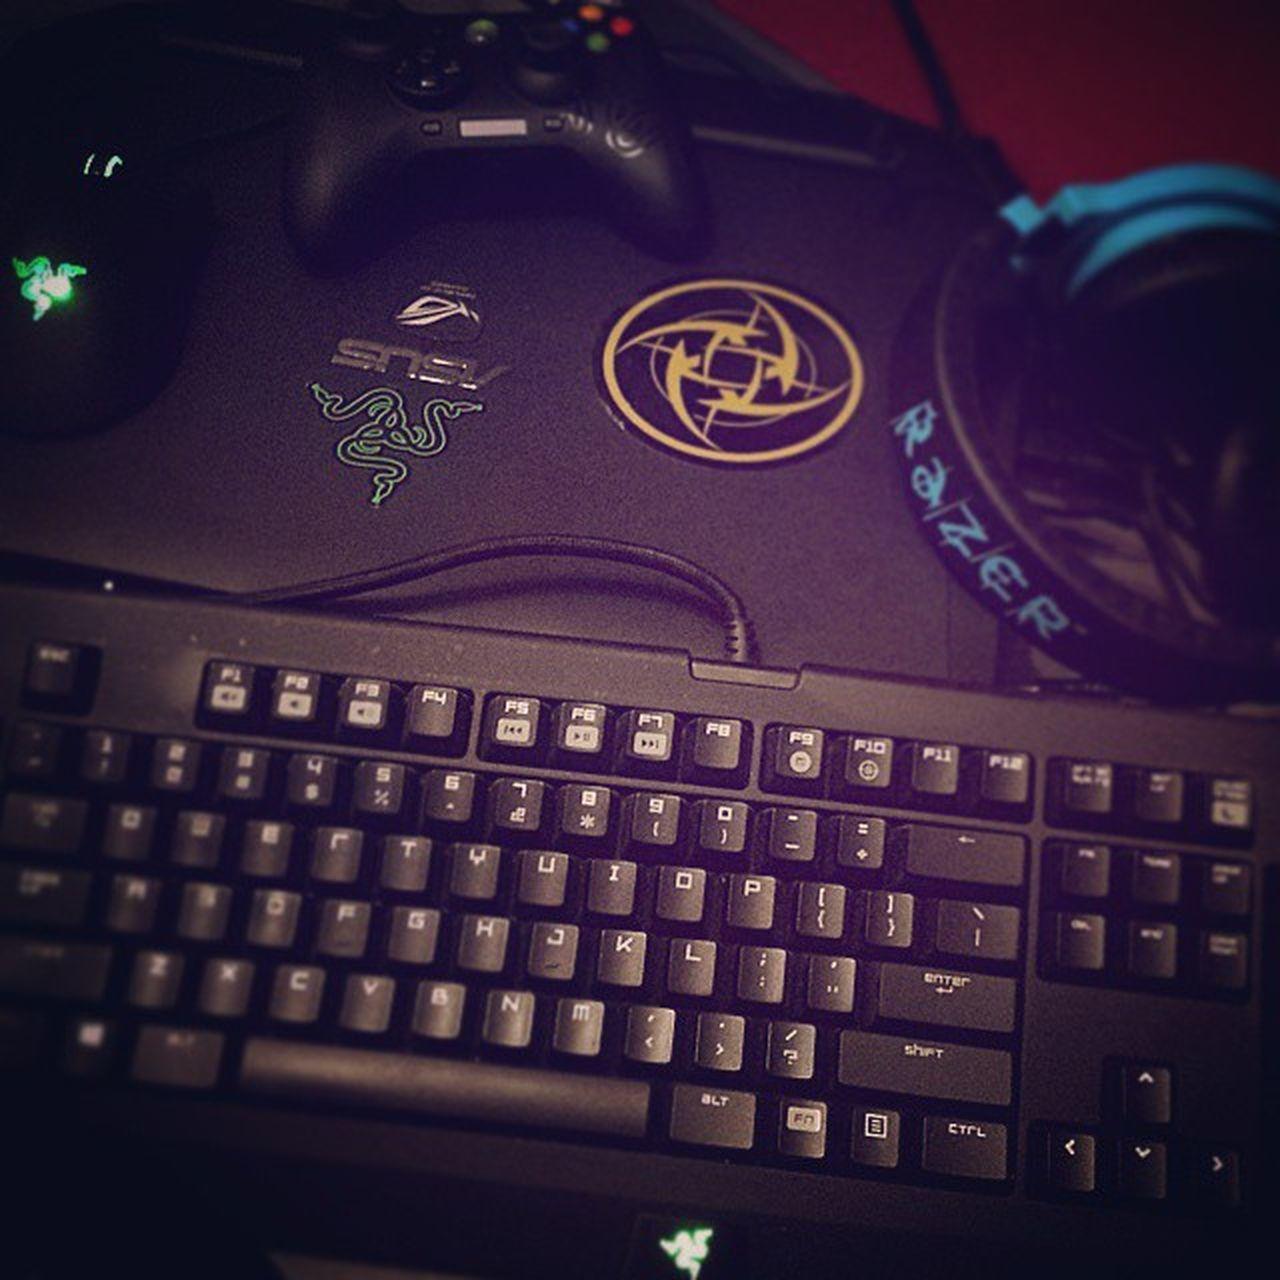 Gaming Gaminglife Razerallday PCGaming Goliathus Nip Nipftw Ninjasinpyjamas Knightskustoms Teamrazer Razerdeathadder Razerkraken Razersabertooth Rog Asus Republicofgamers Asusrog G750 Nipofficial Razergoliathus